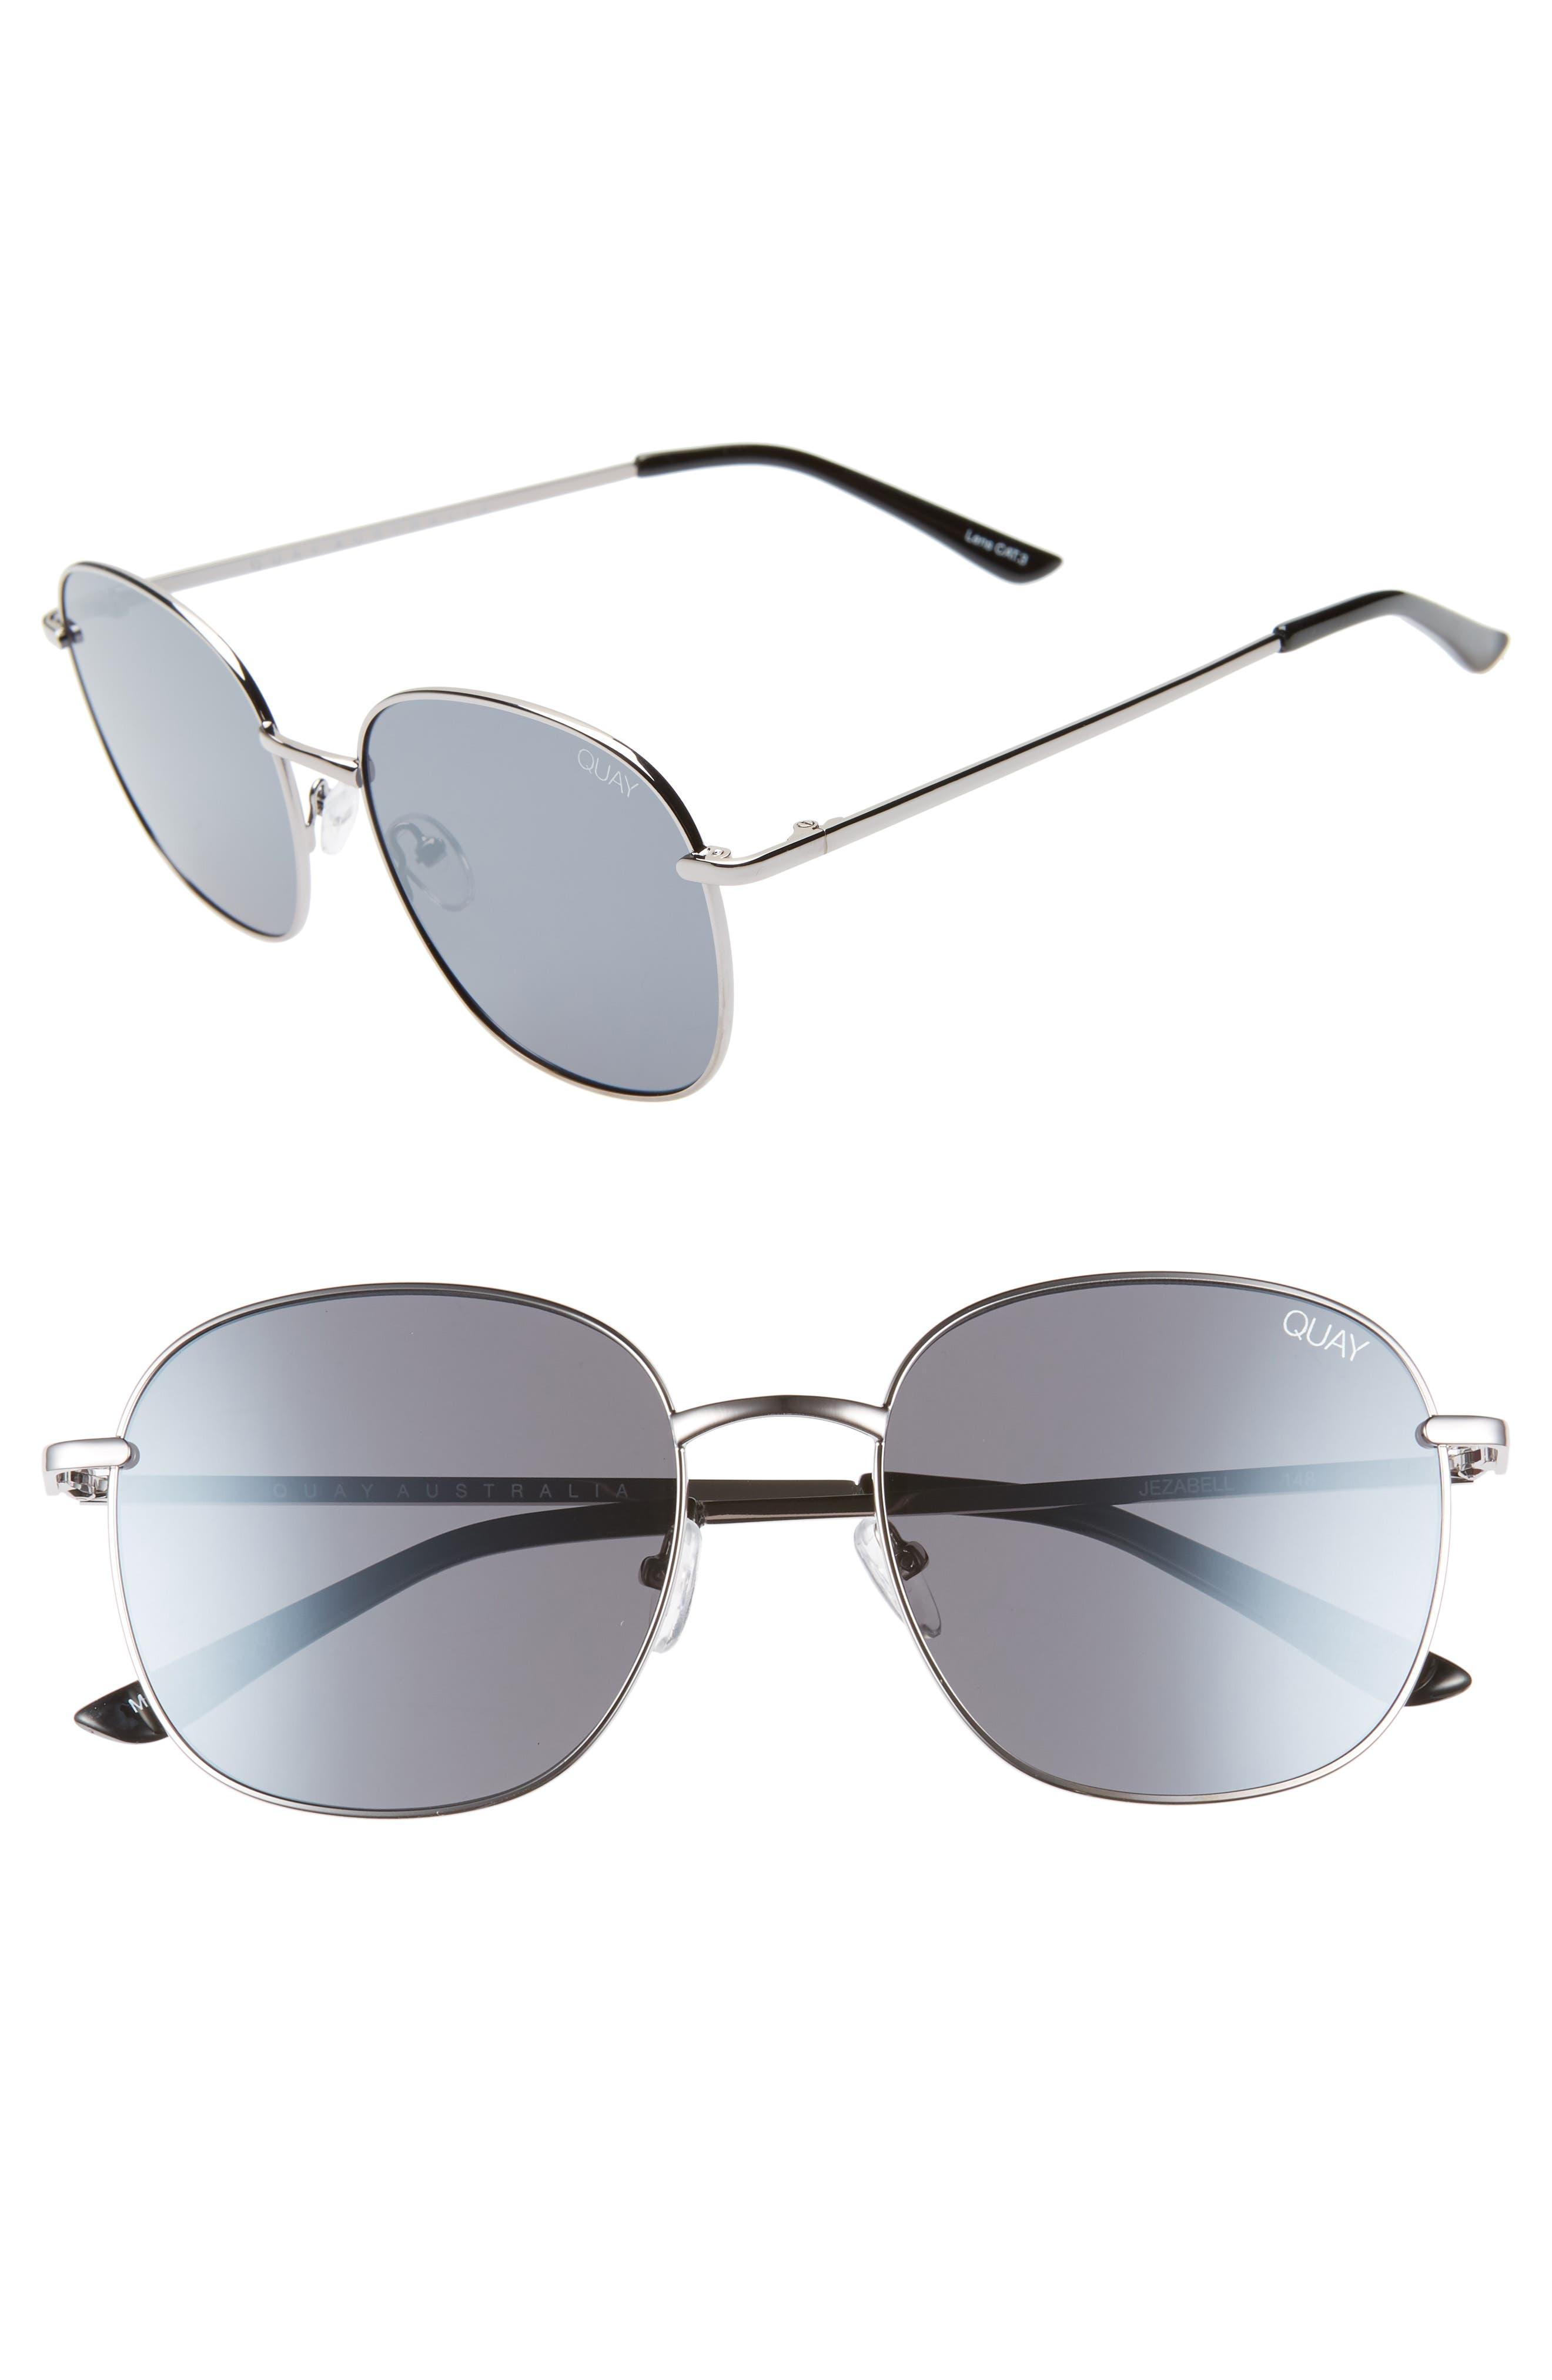 QUAY AUSTRALIA, Jezabell 57mm Round Sunglasses, Main thumbnail 1, color, GUNMETAL / SILVER MIRROR